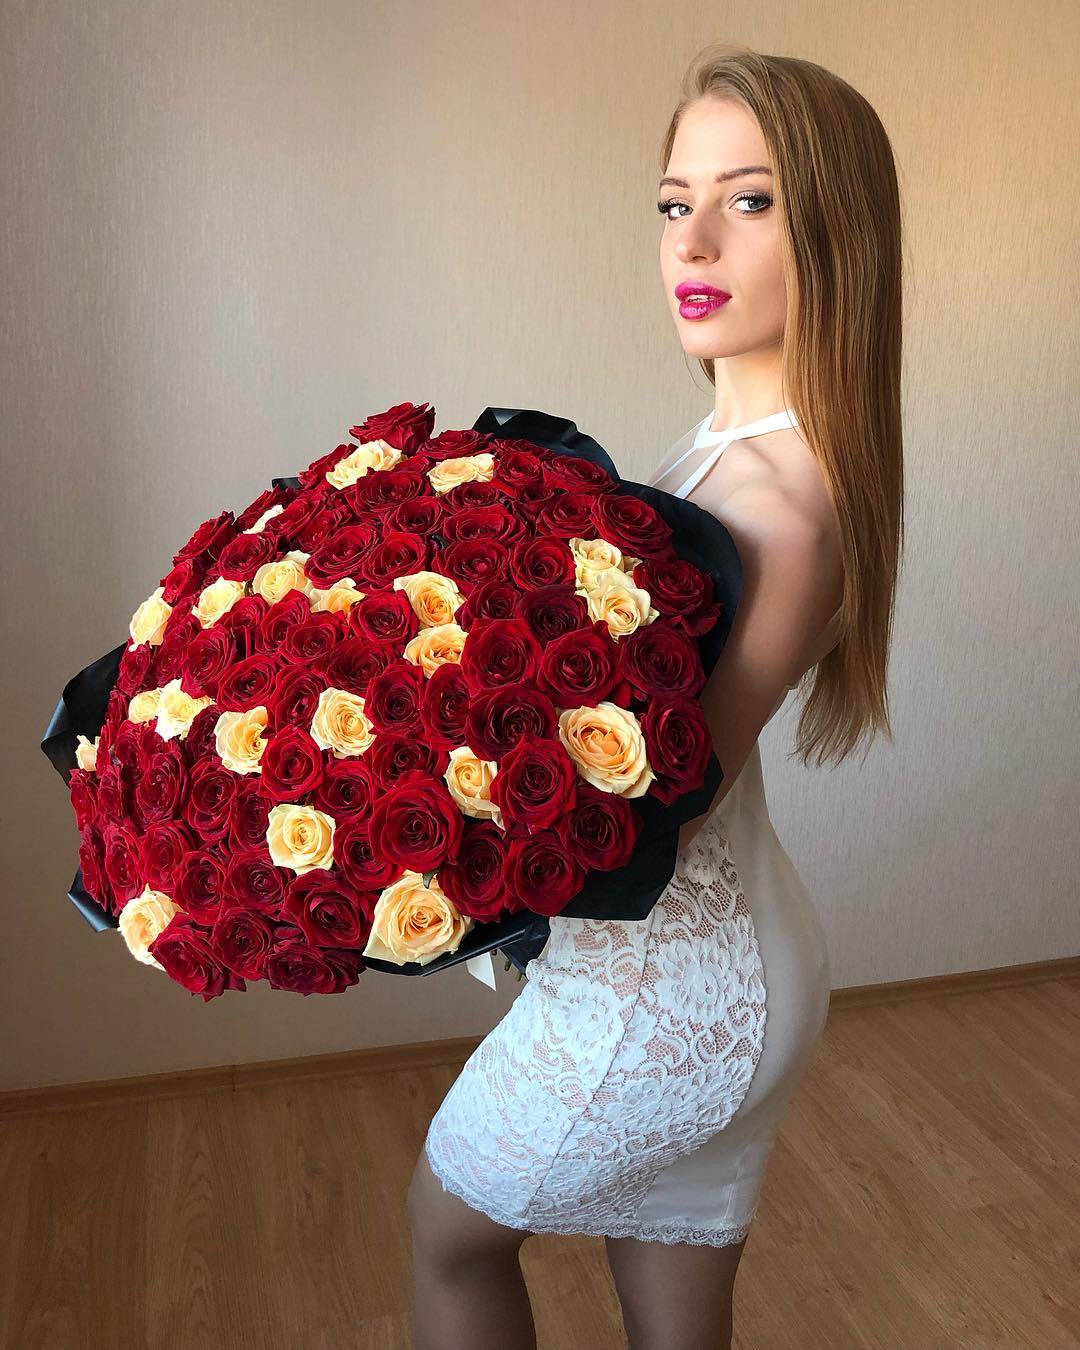 Polina-Dubkova-Wa-a-ers-Insta-Fit-Bio-5